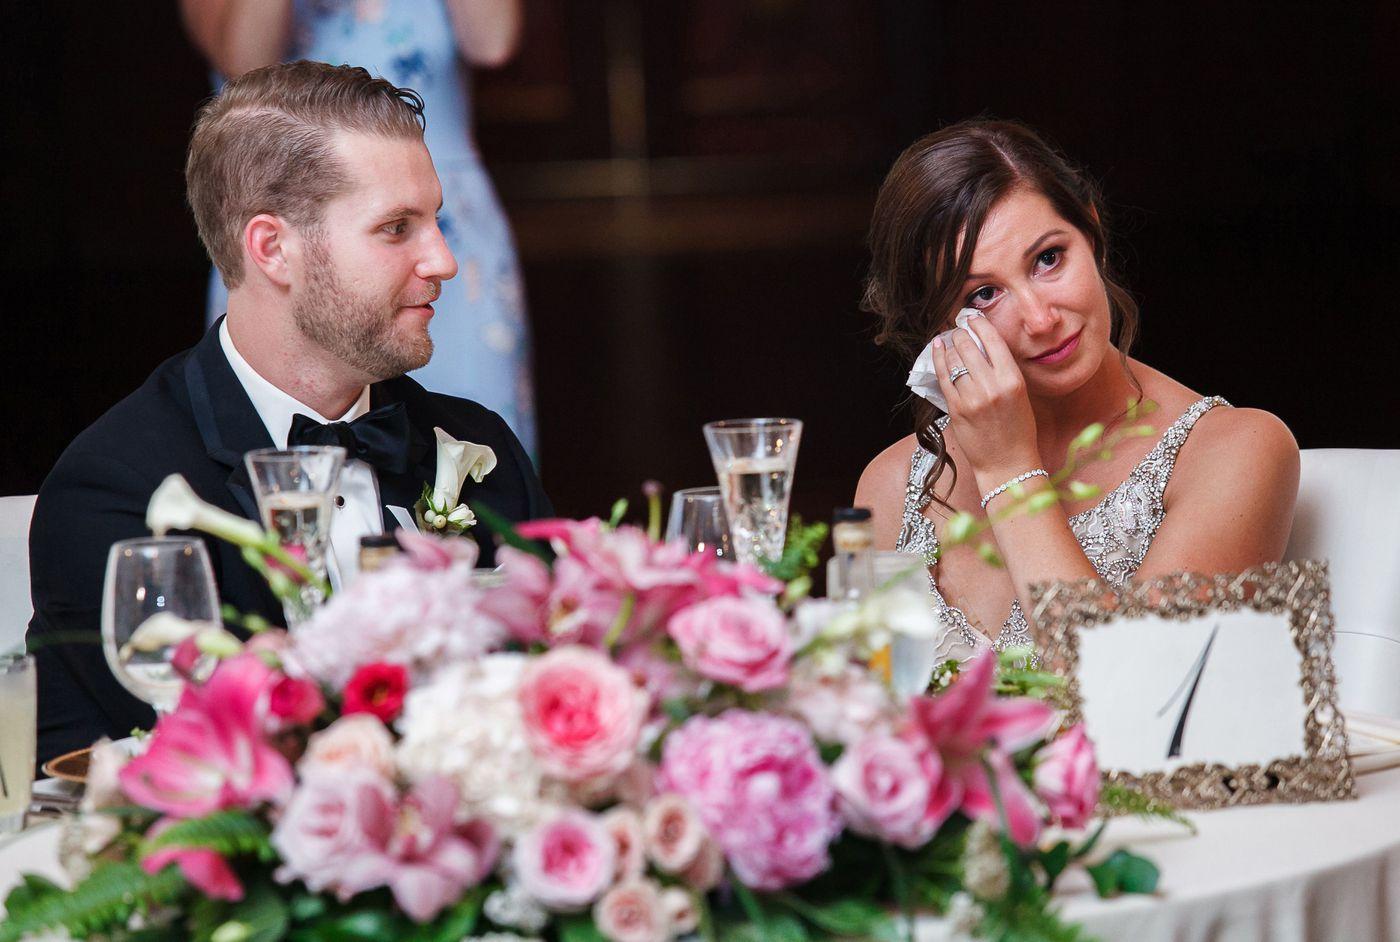 Philadelphia weddings: Elise Del Casale & Bill Viscuso